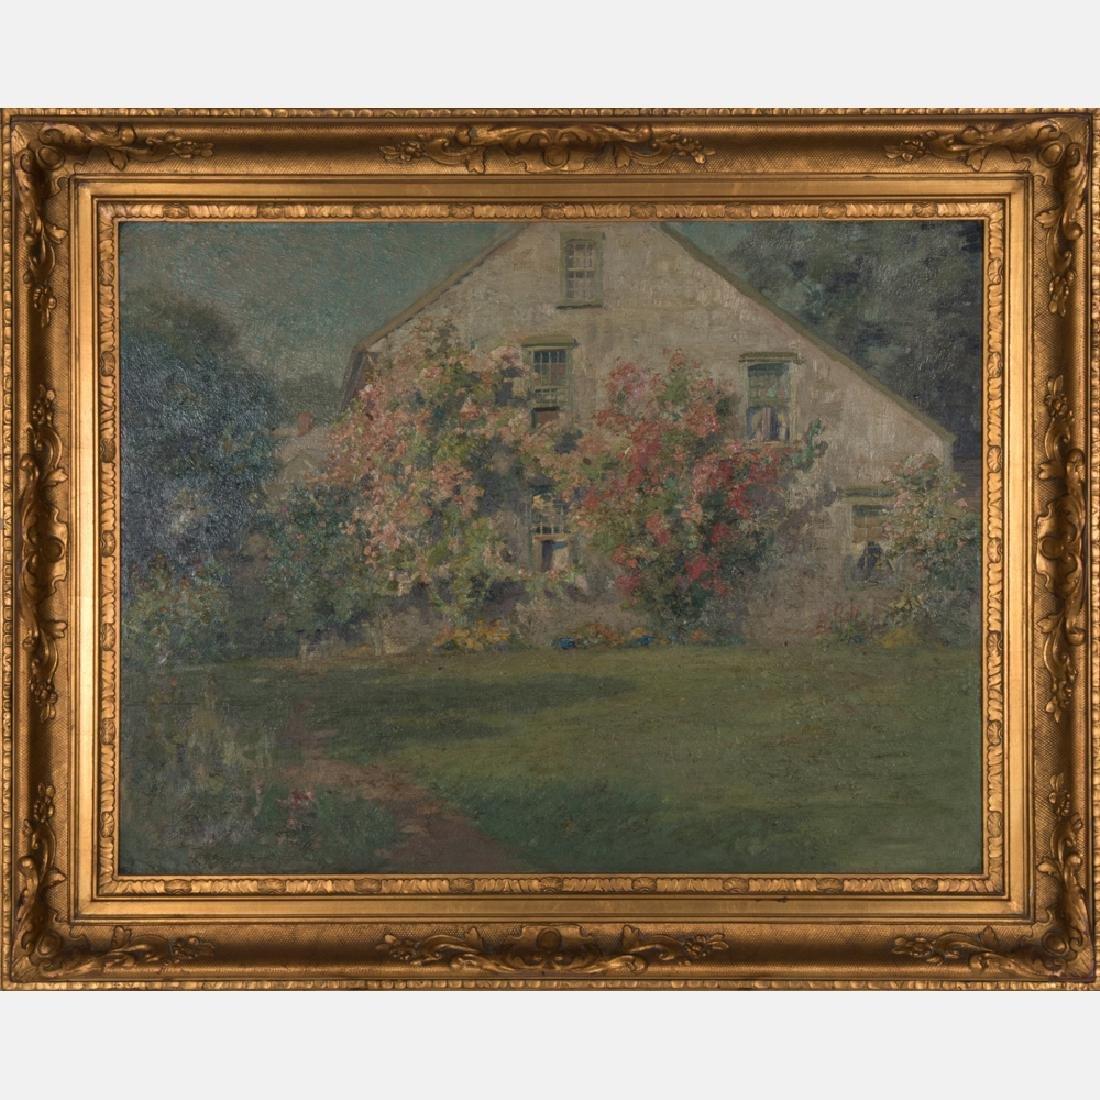 Edmund Henry Garrett (1853-1929) Landscape with House,